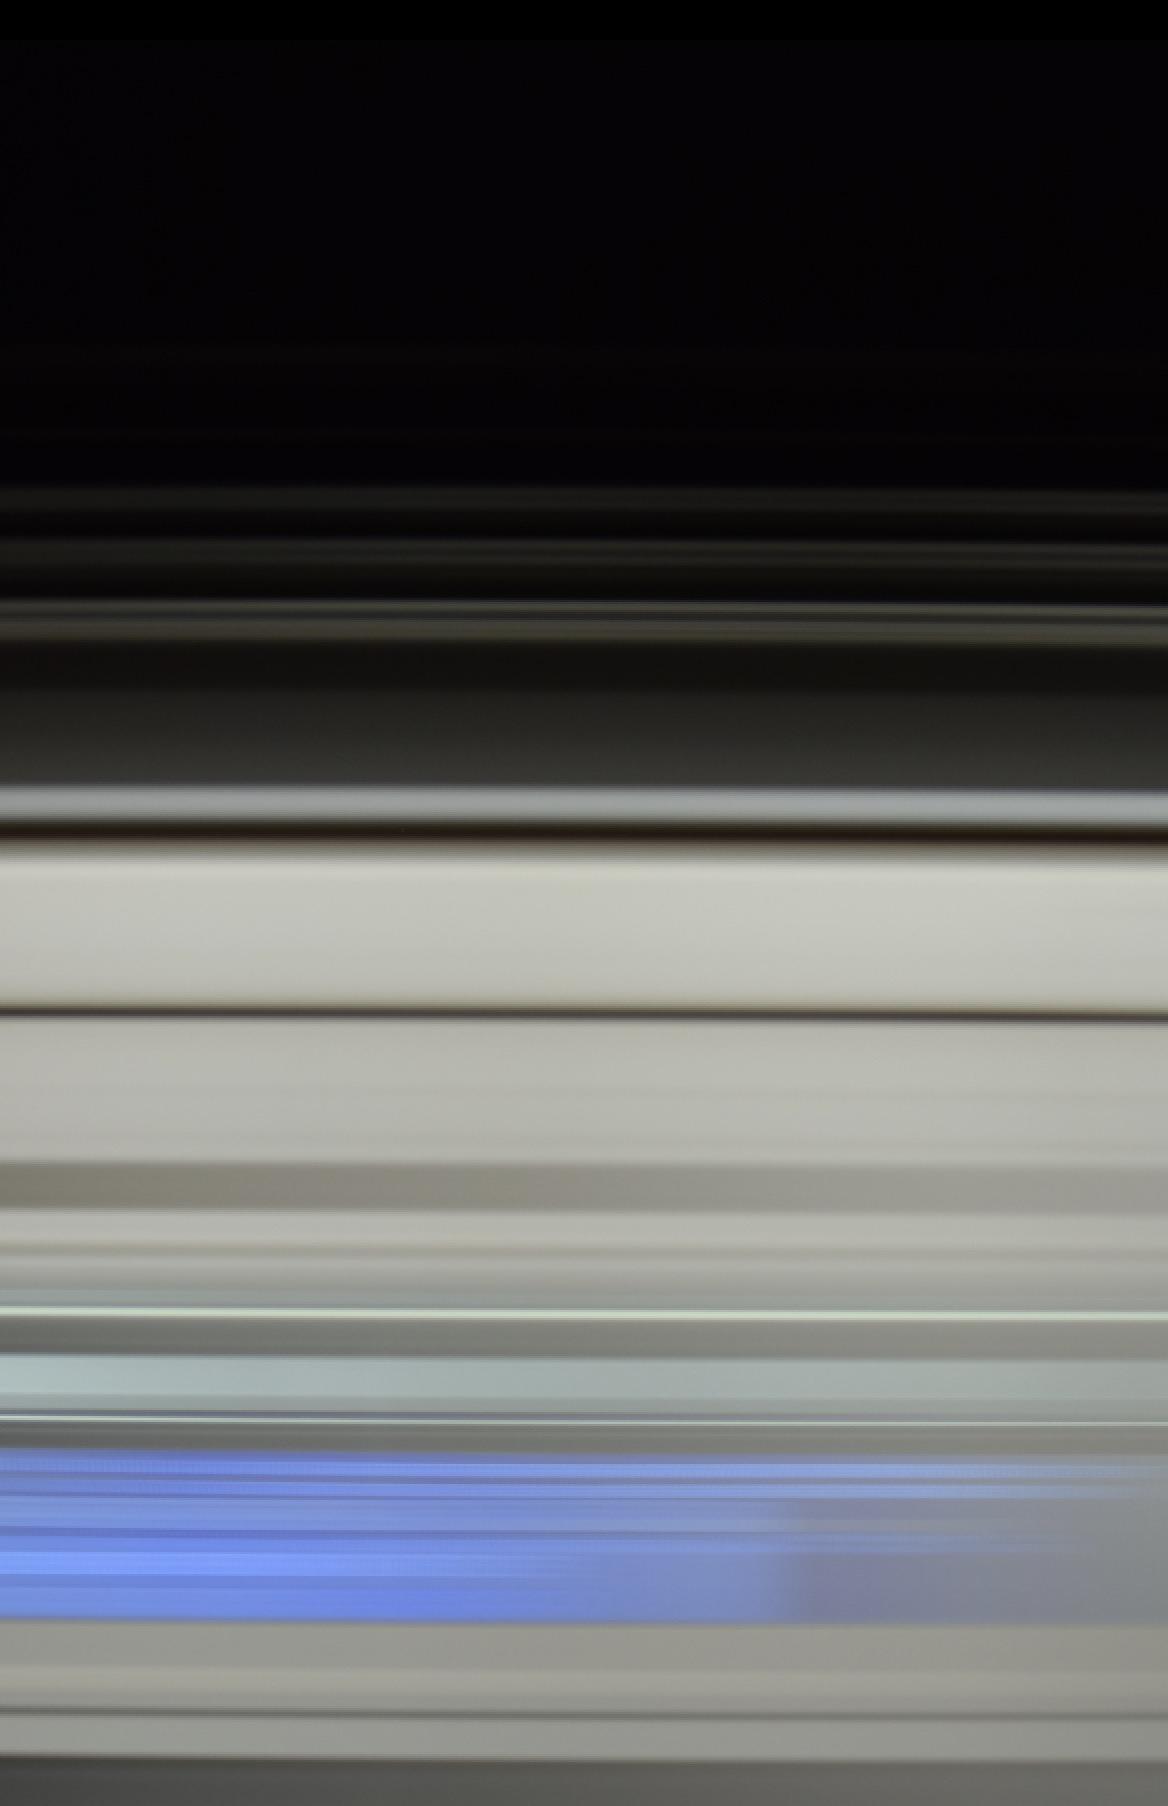 Screen Shot 2017-06-11 at 7.40.15 PM.jpg